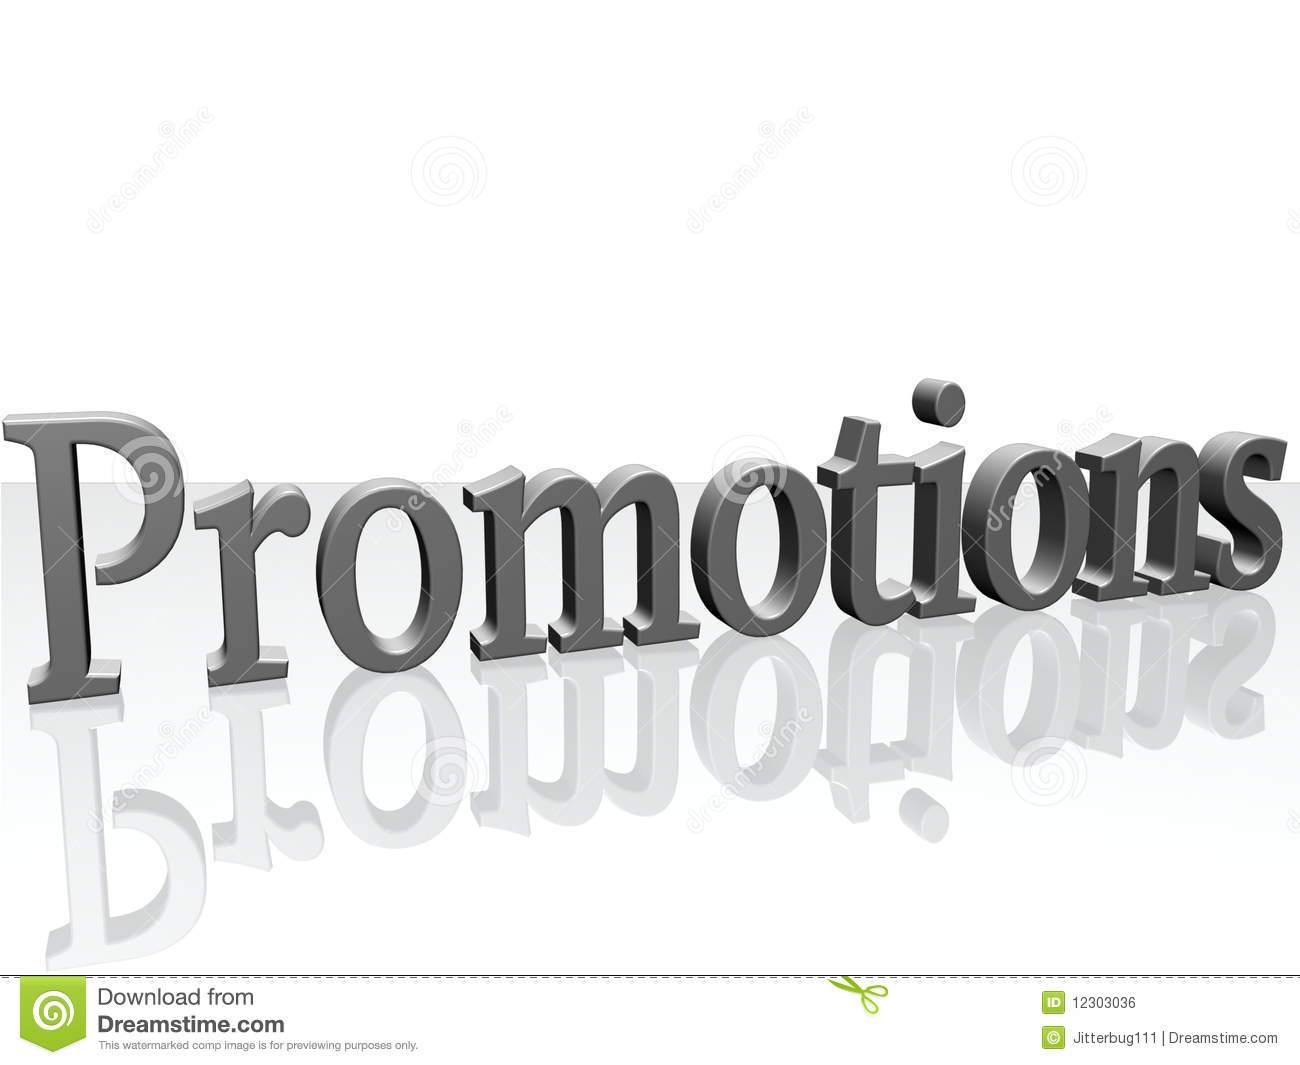 Promotions clipart 7 » Clipart Portal.